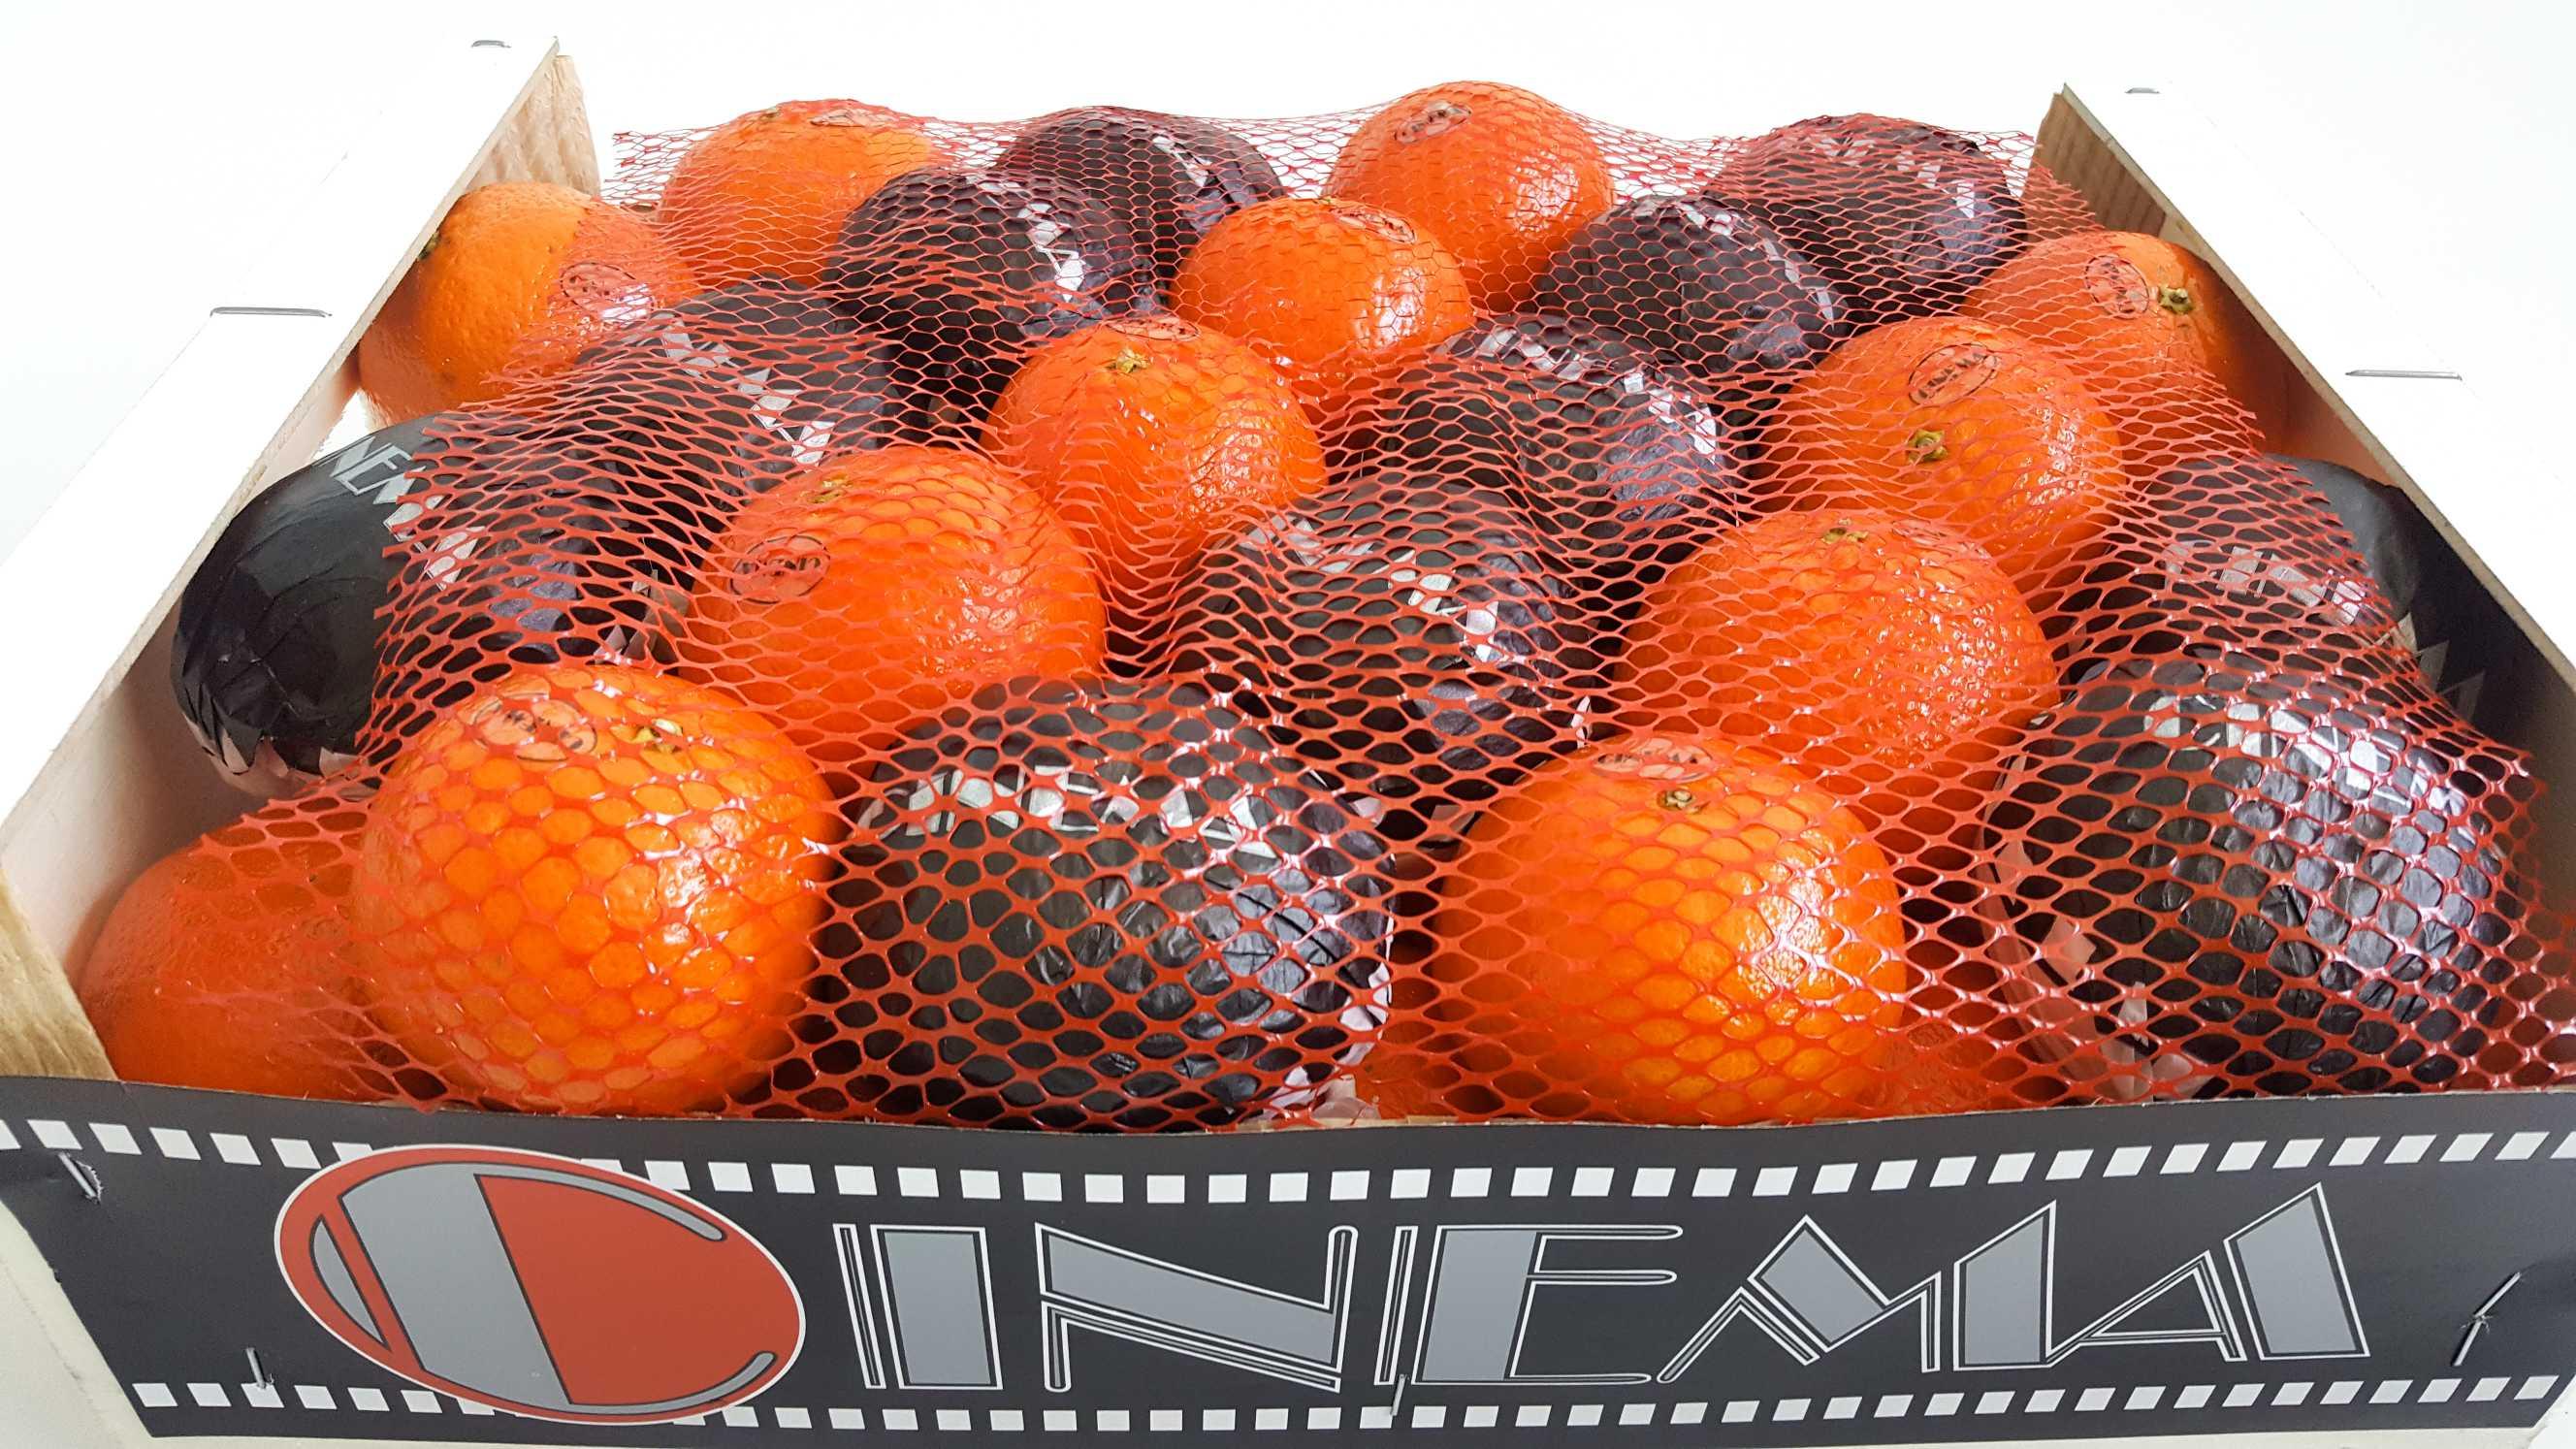 Mandarina-encajada-10kg-cinema-germansfuster